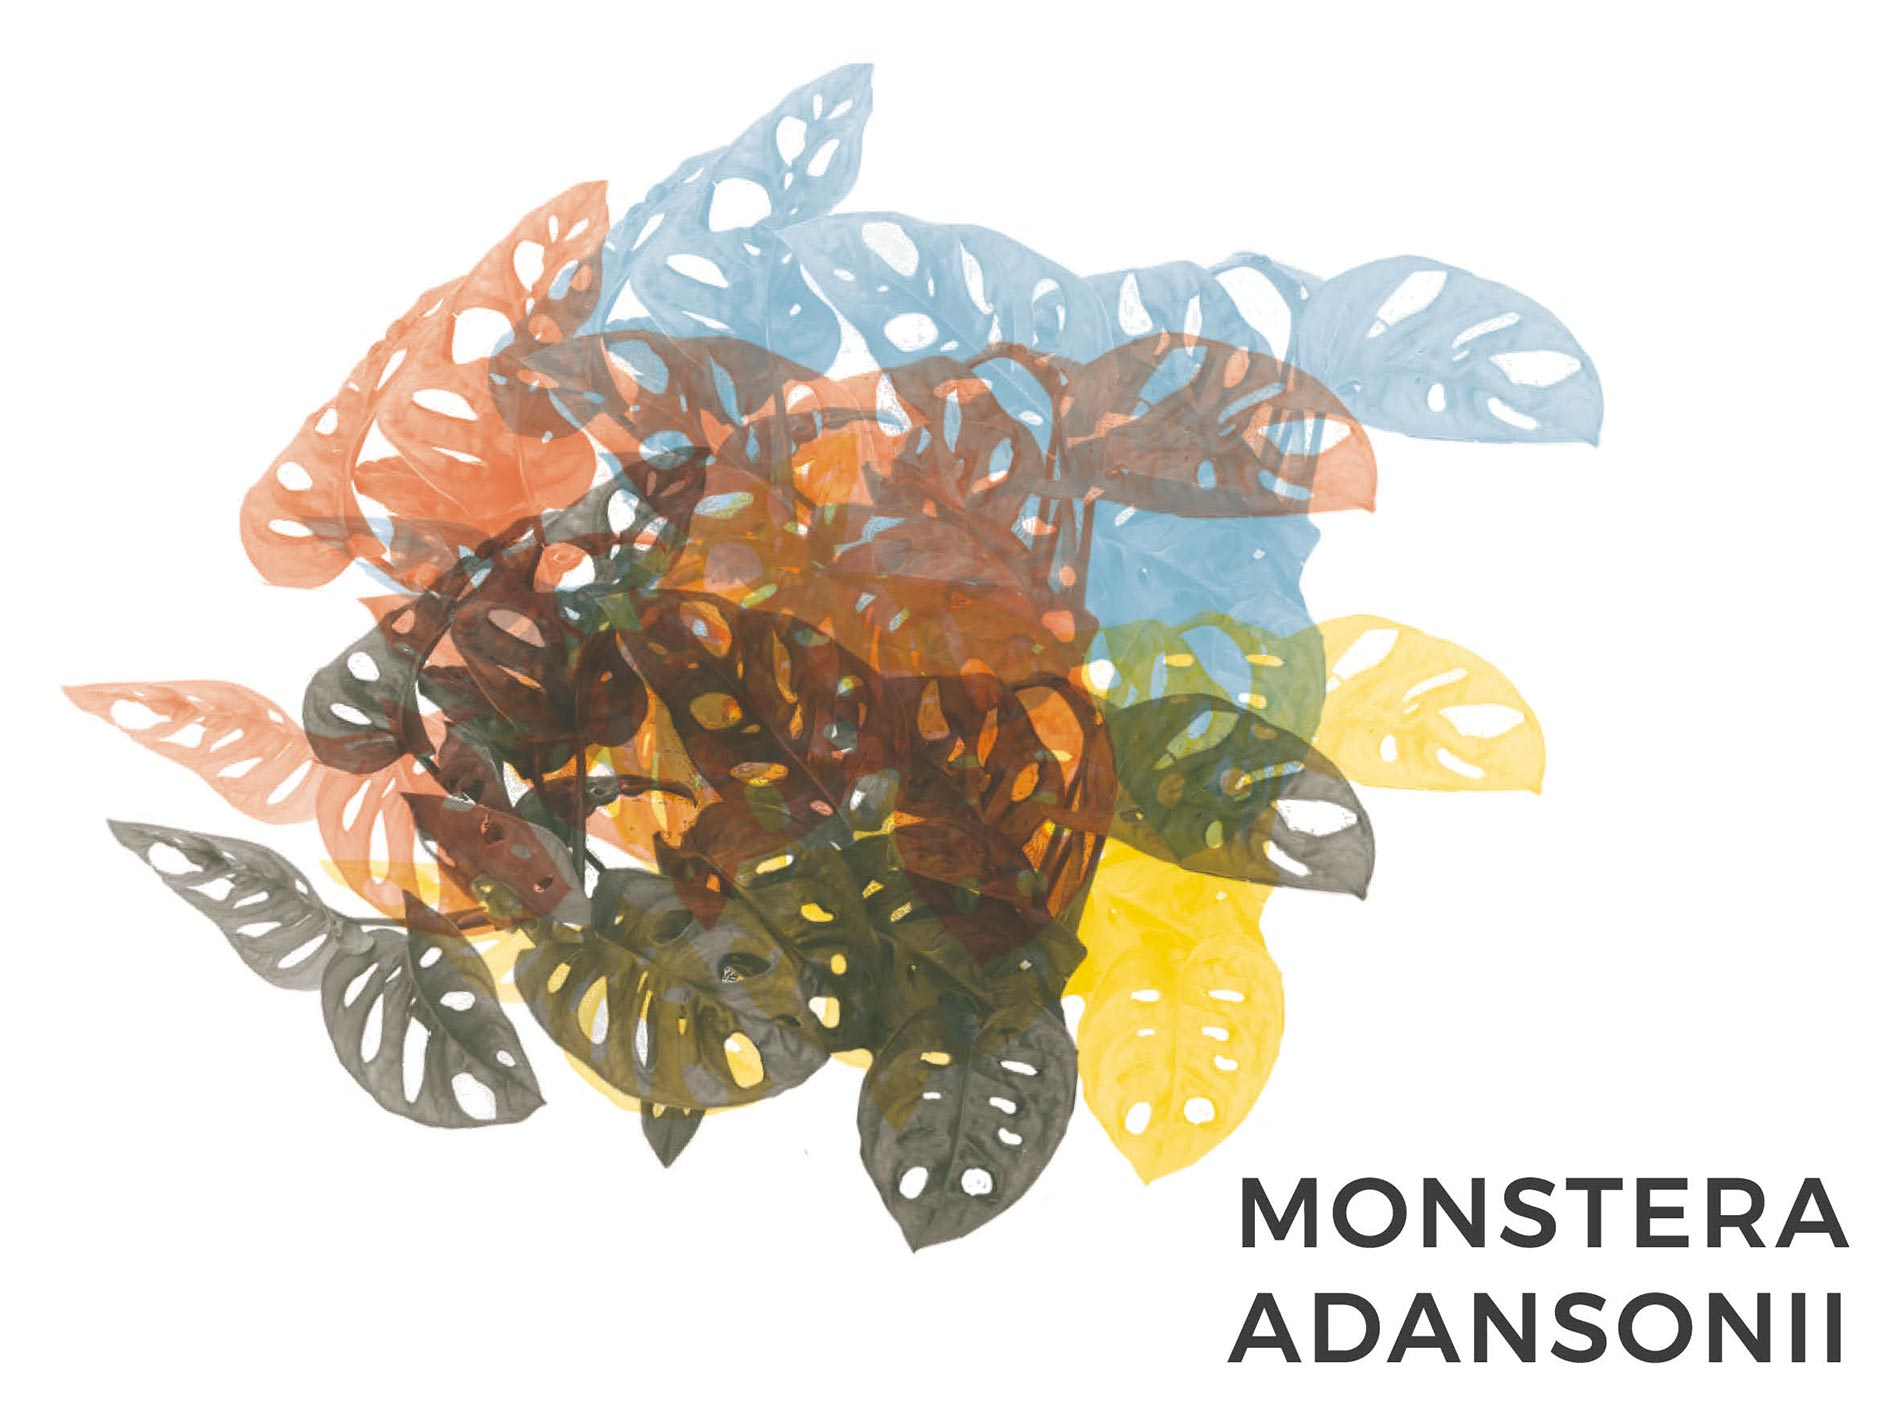 monstera adansonii